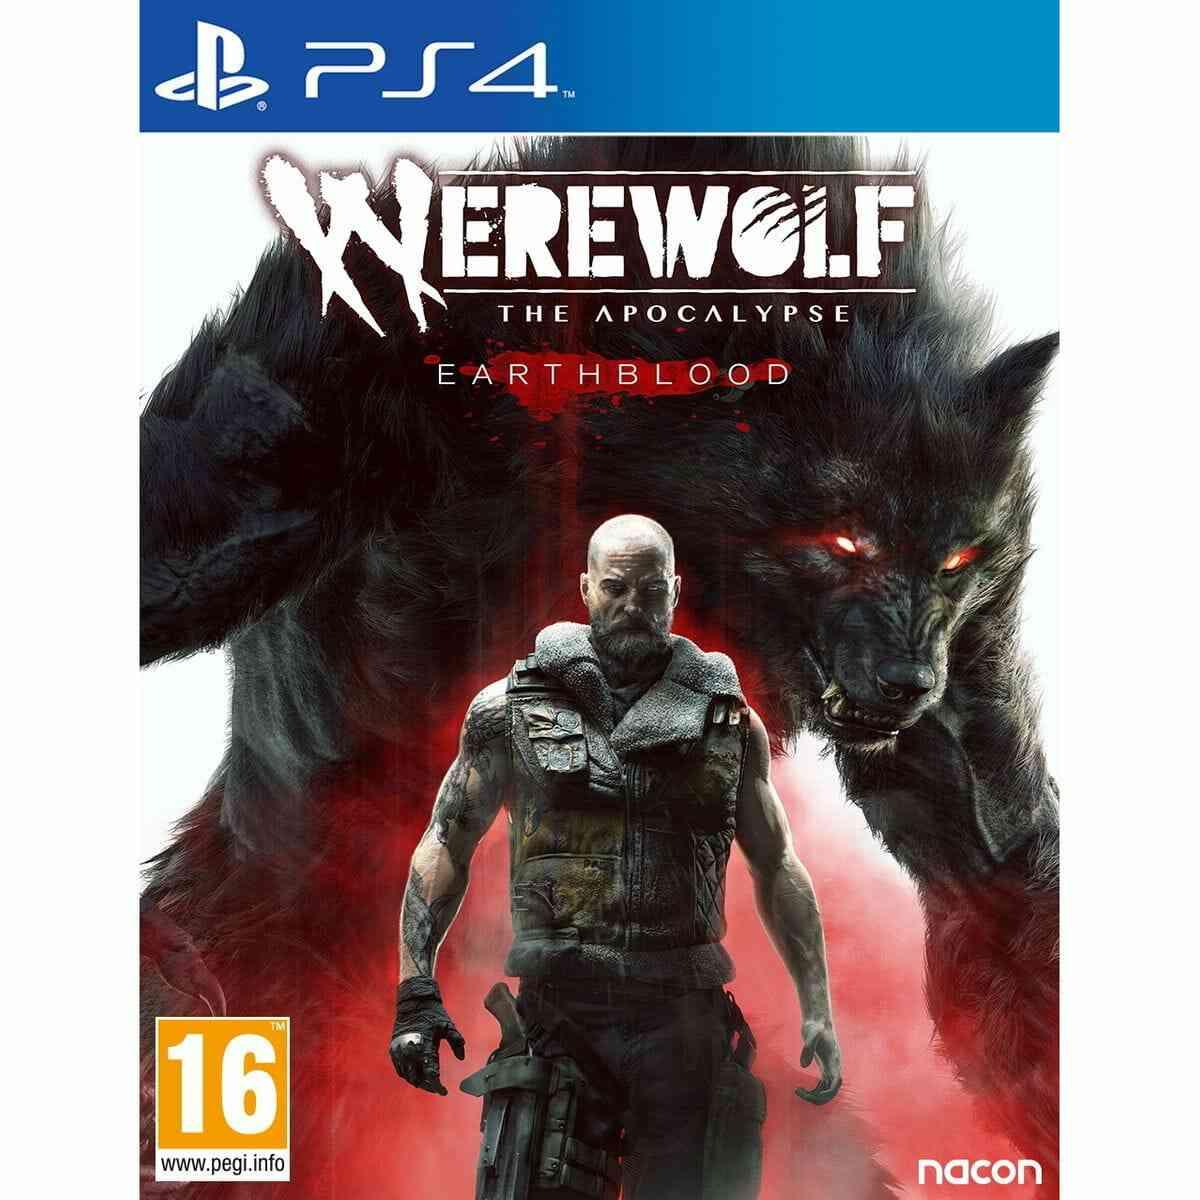 Werewolf The Apocalypse Earthblood PS4 1